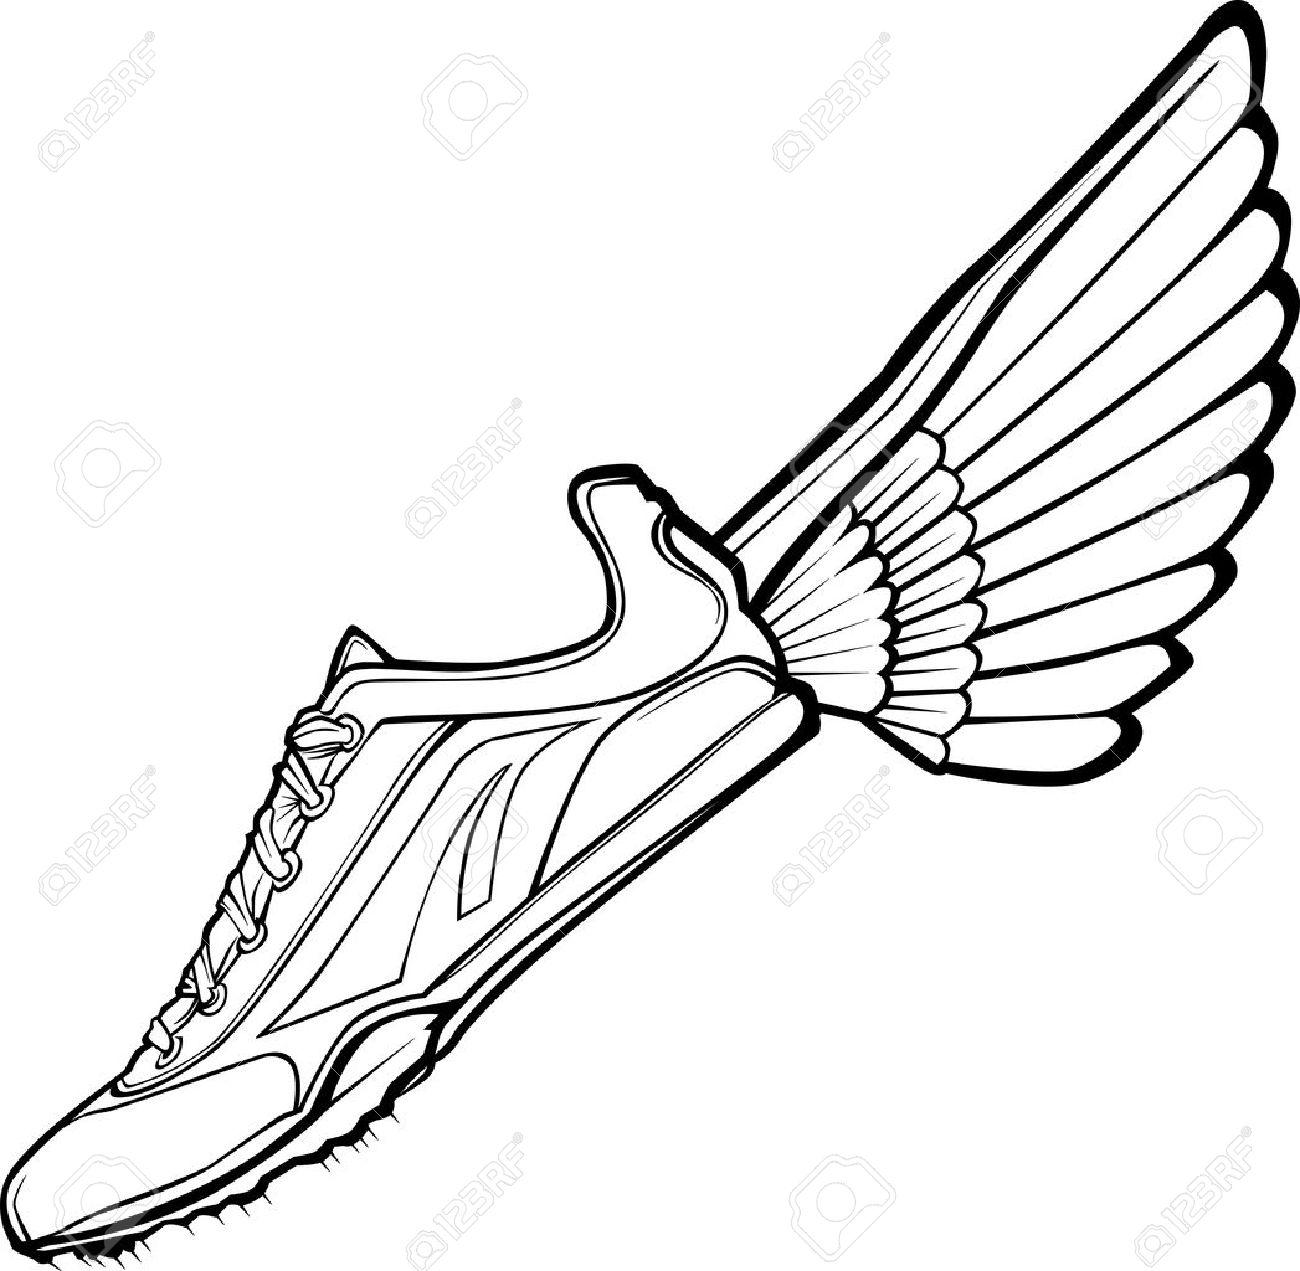 Shoe Logo Stock Photos & Pictures. Royalty Free Shoe Logo Images ...